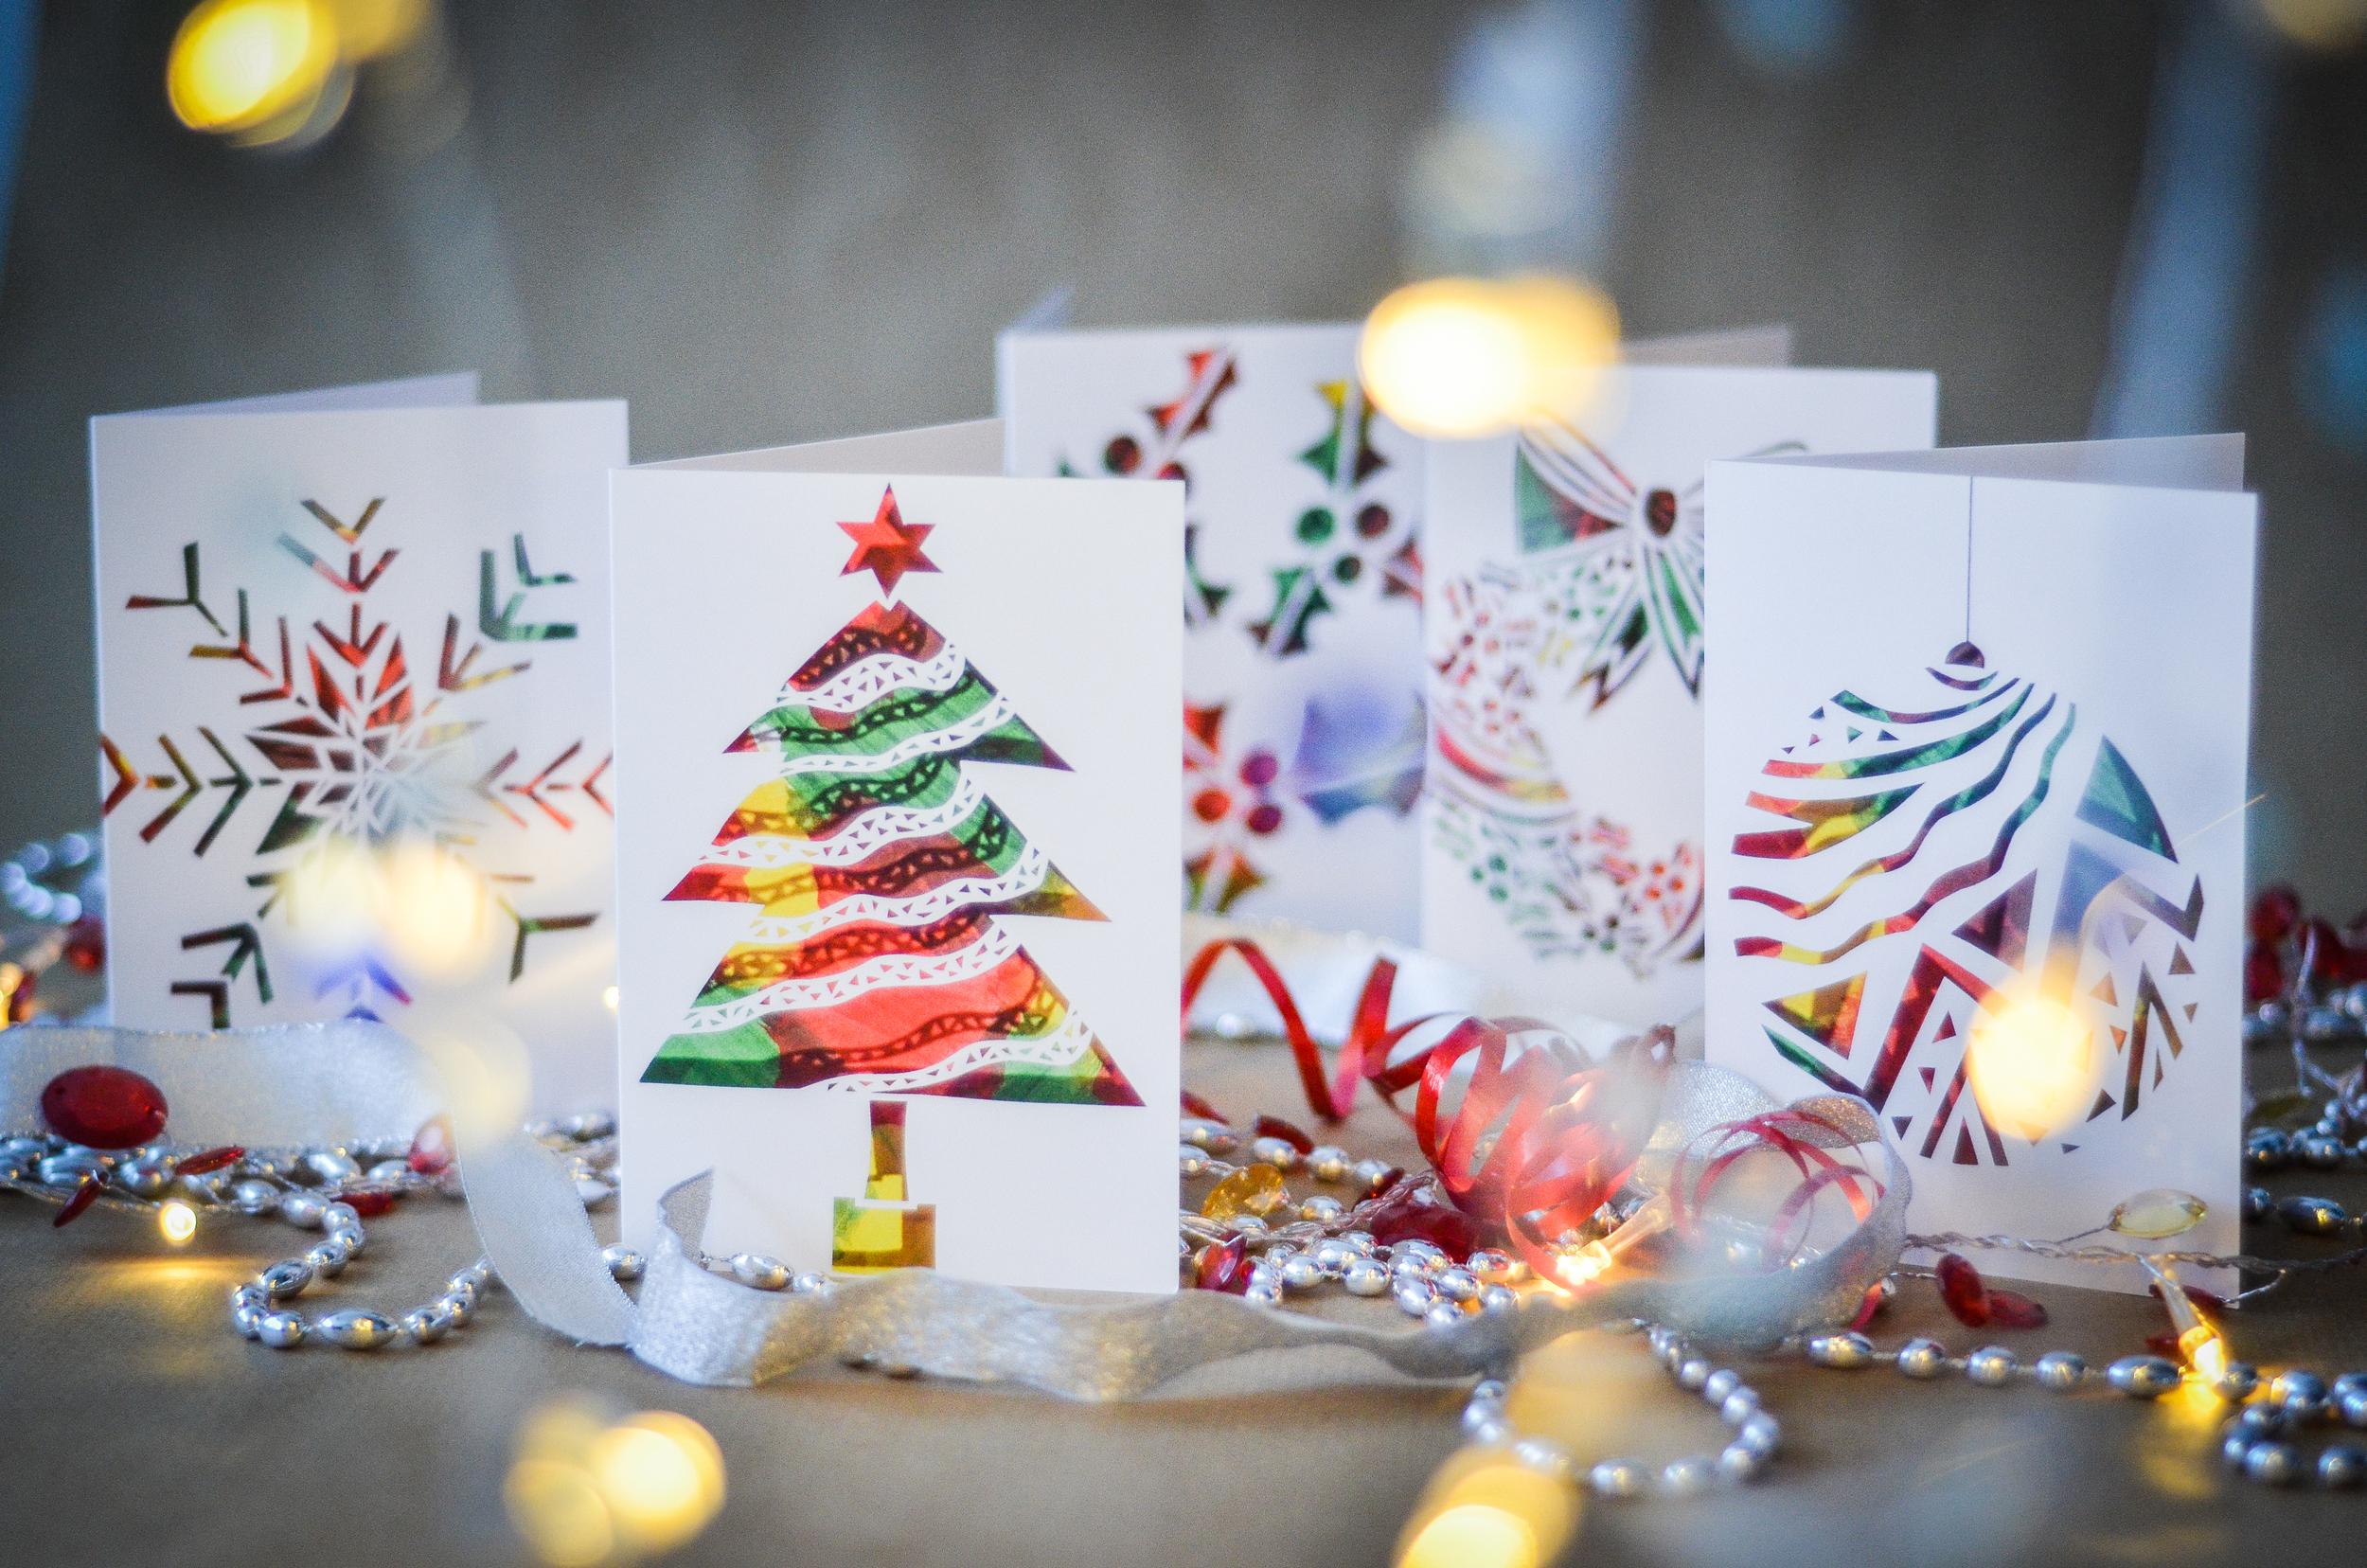 2013 Full Christmas Card Collection (2).jpg